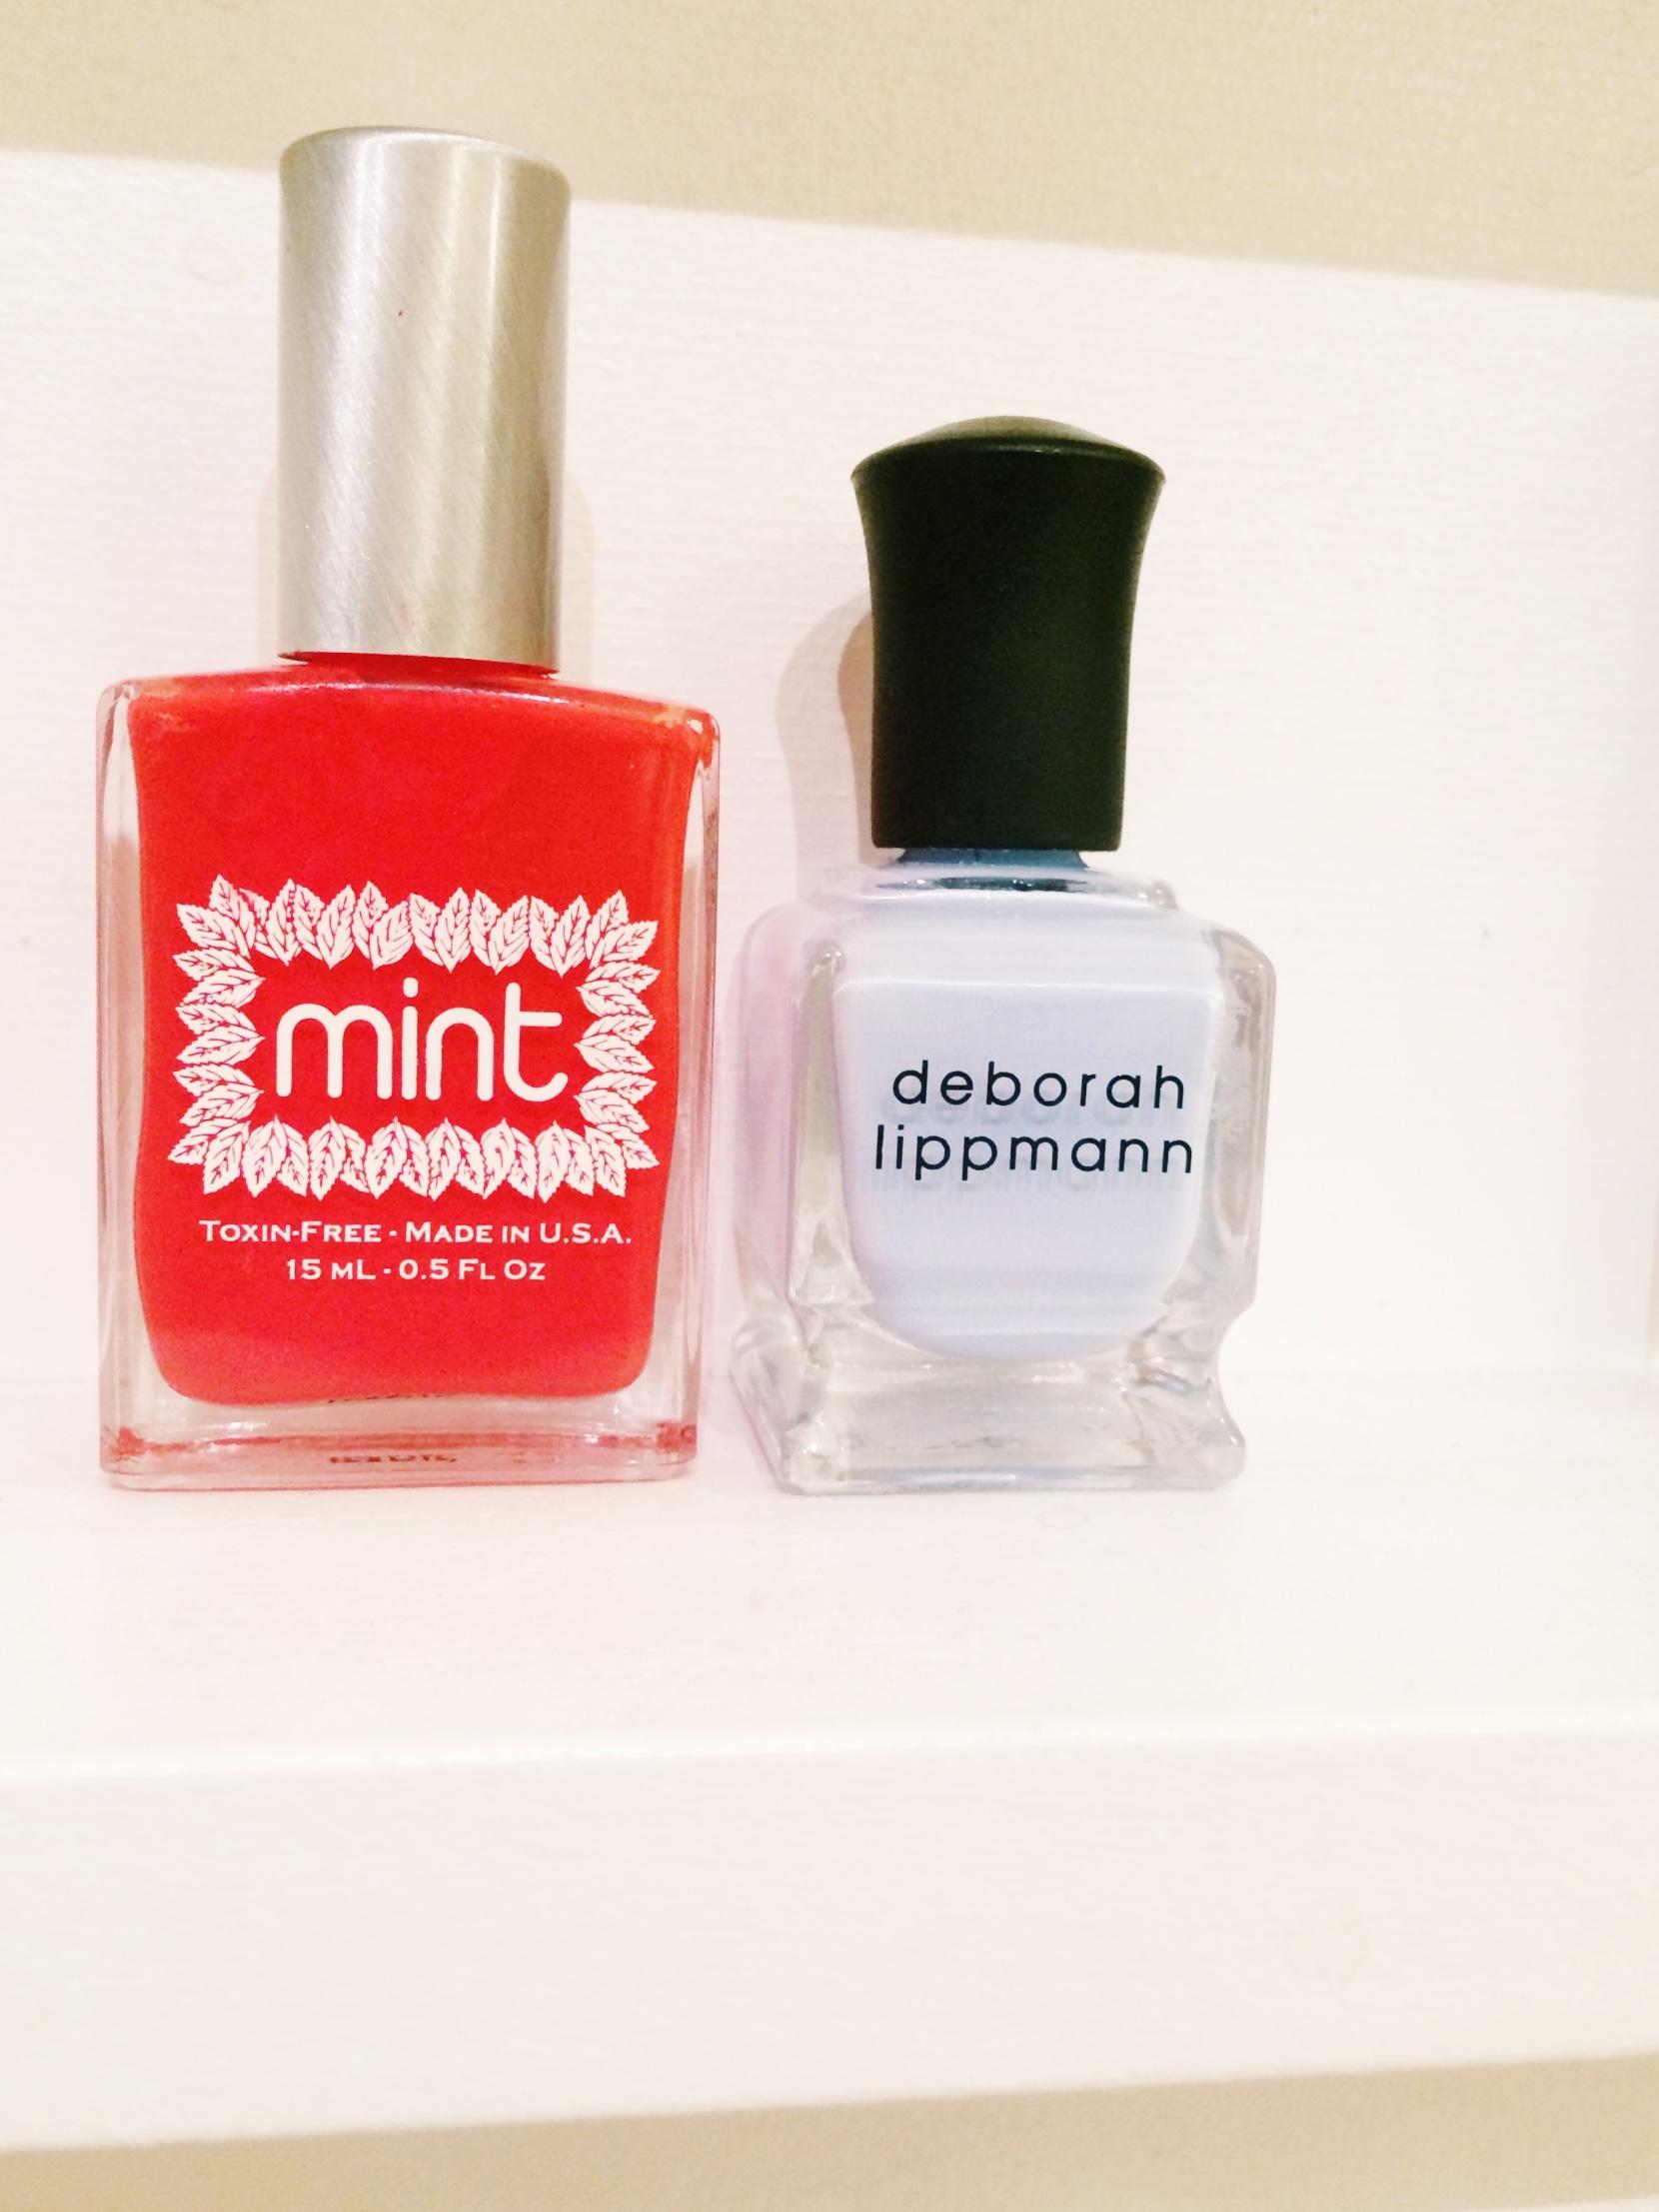 Deborah Lippmann & Mint